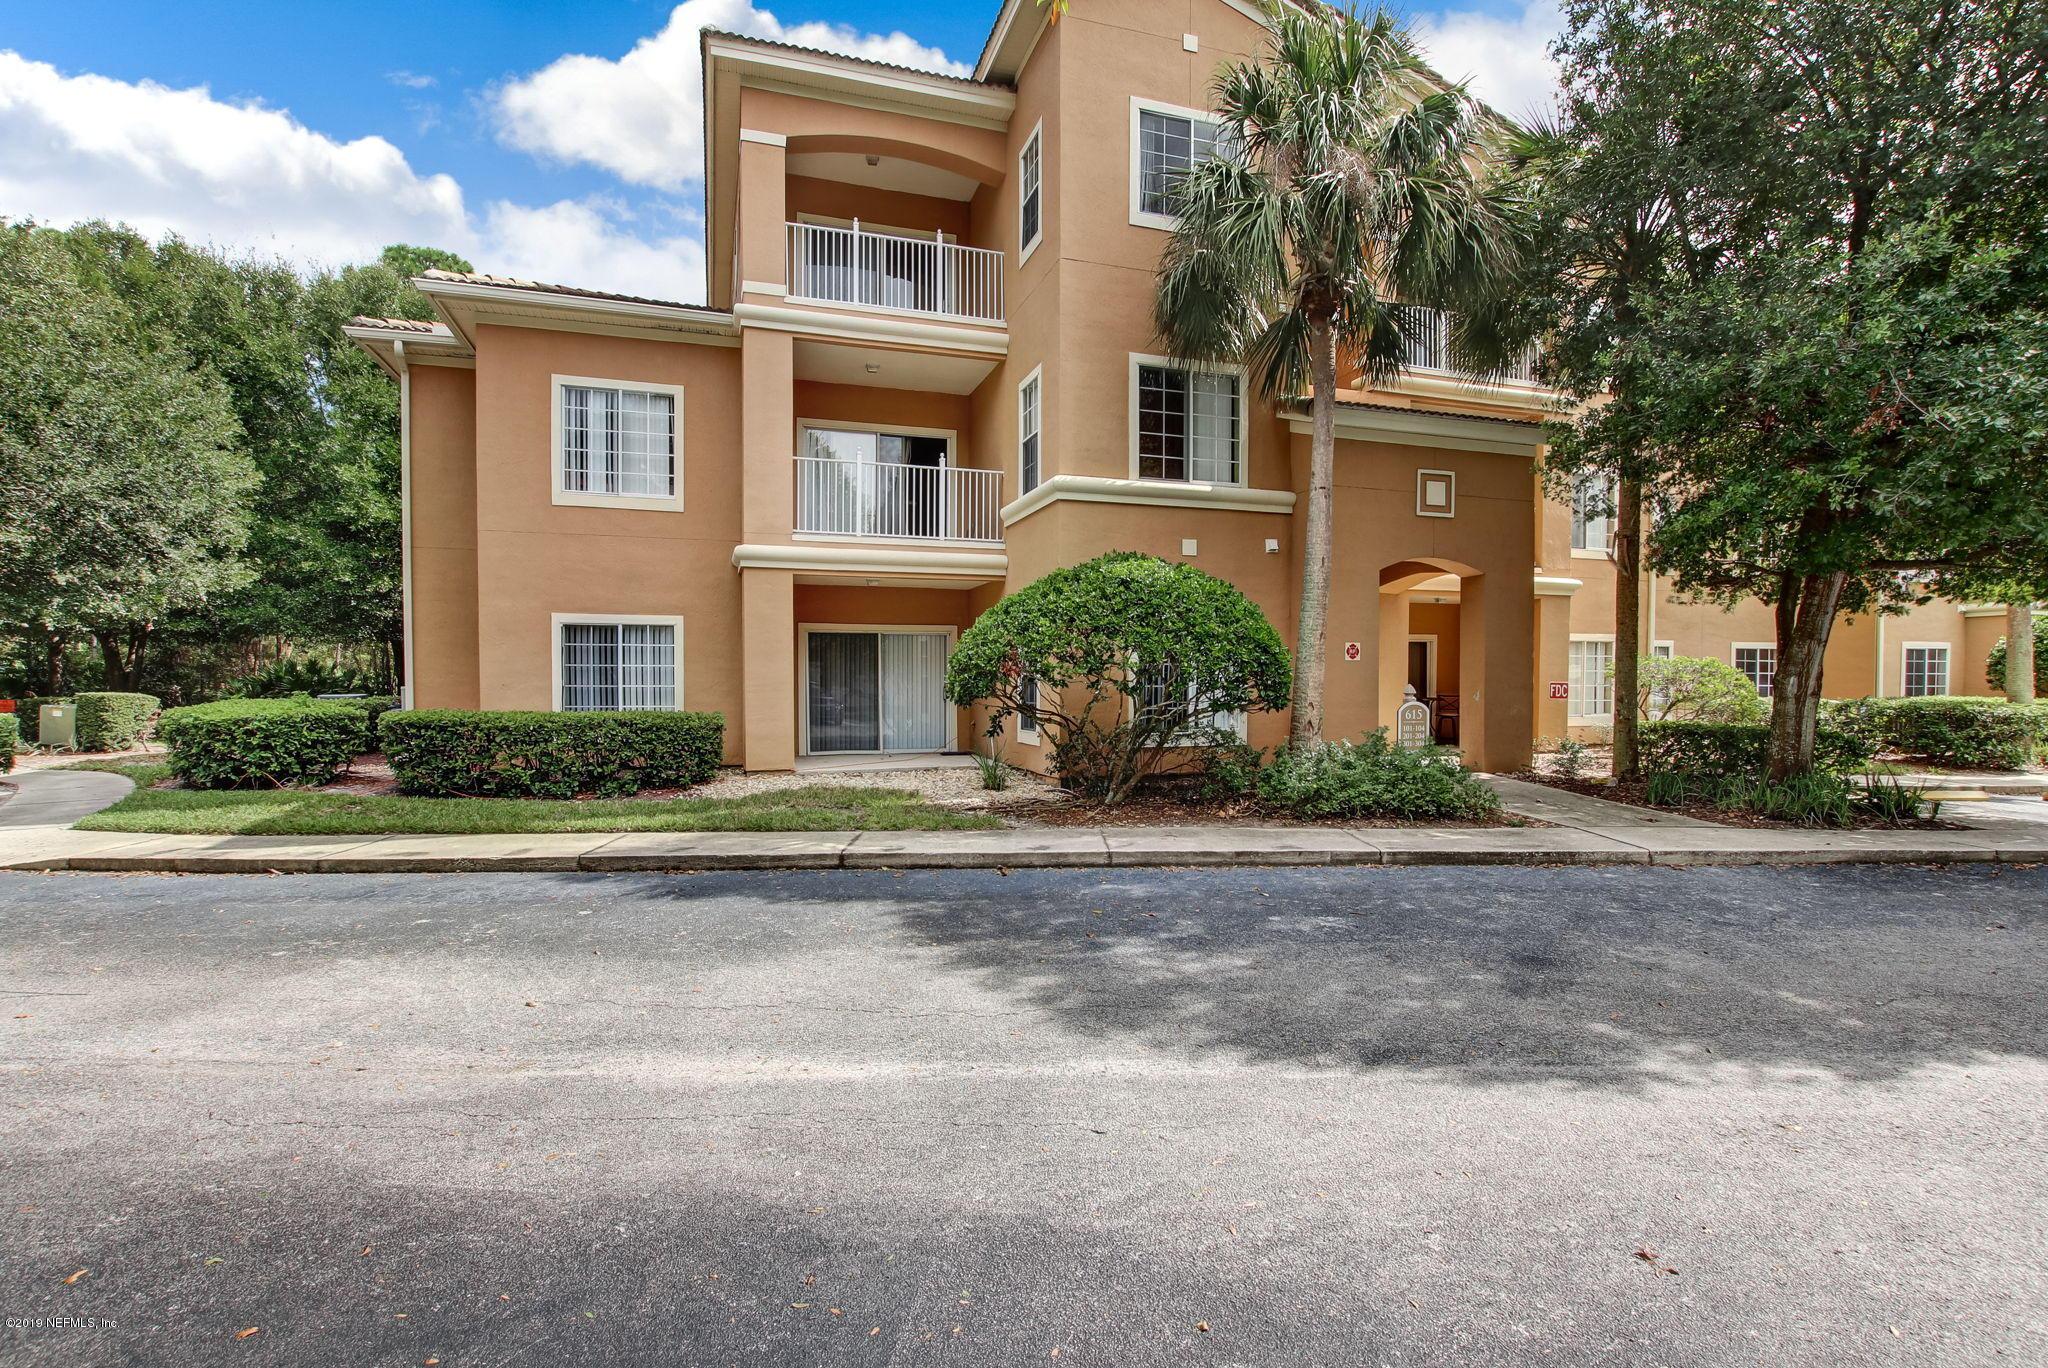 615 FAIRWAY, ST AUGUSTINE, FLORIDA 32084, 1 Bedroom Bedrooms, ,1 BathroomBathrooms,Condo,For sale,FAIRWAY,1021296